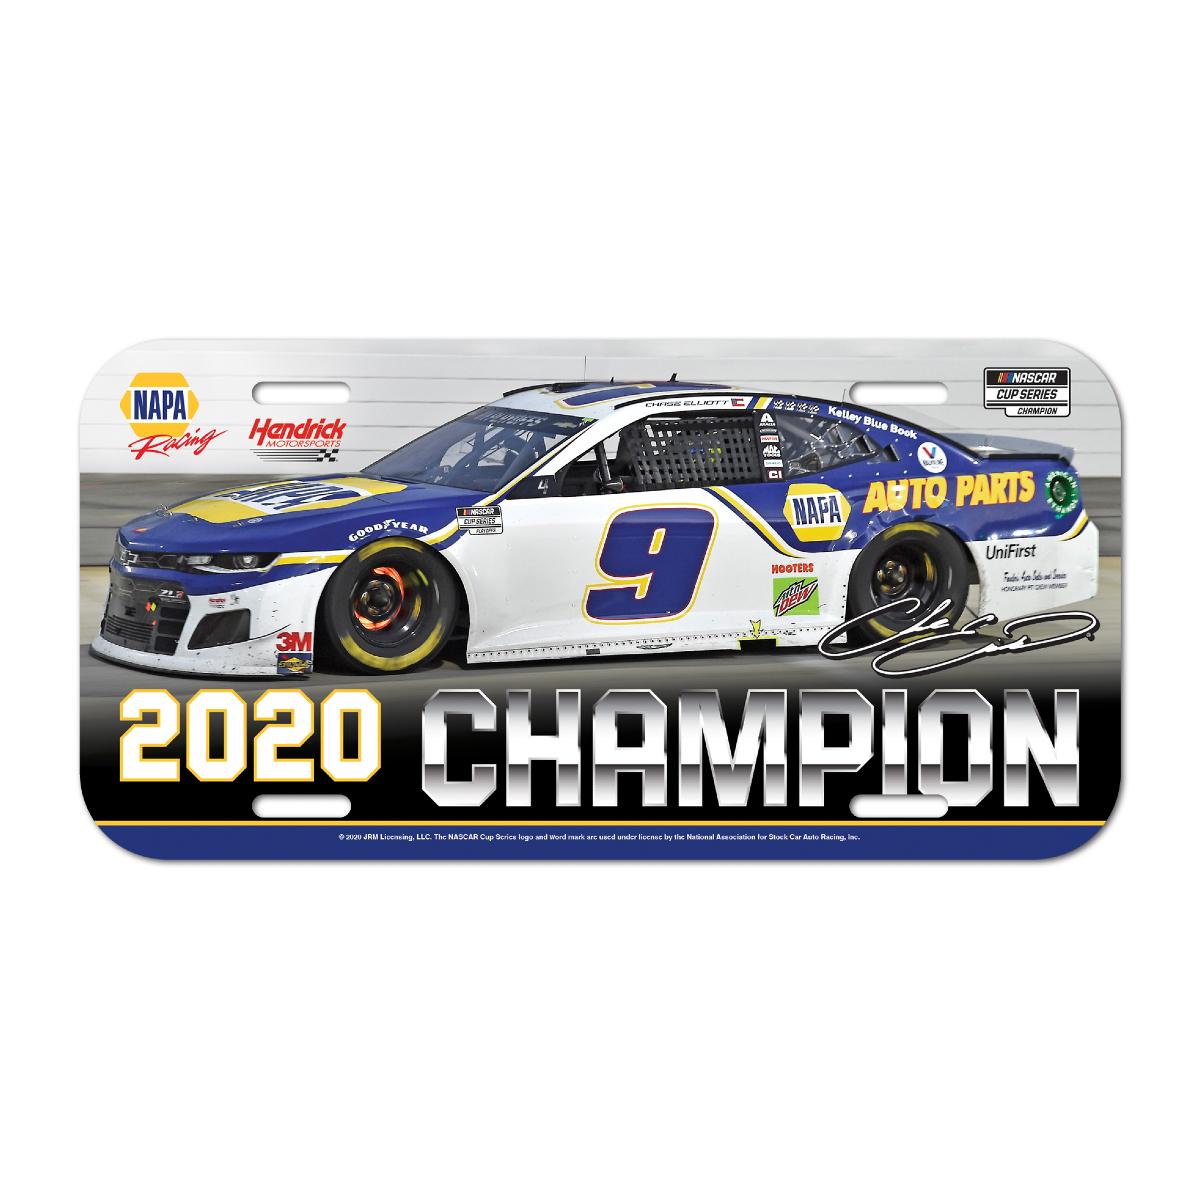 NASCAR 2020 Champion License Plate – Plastic